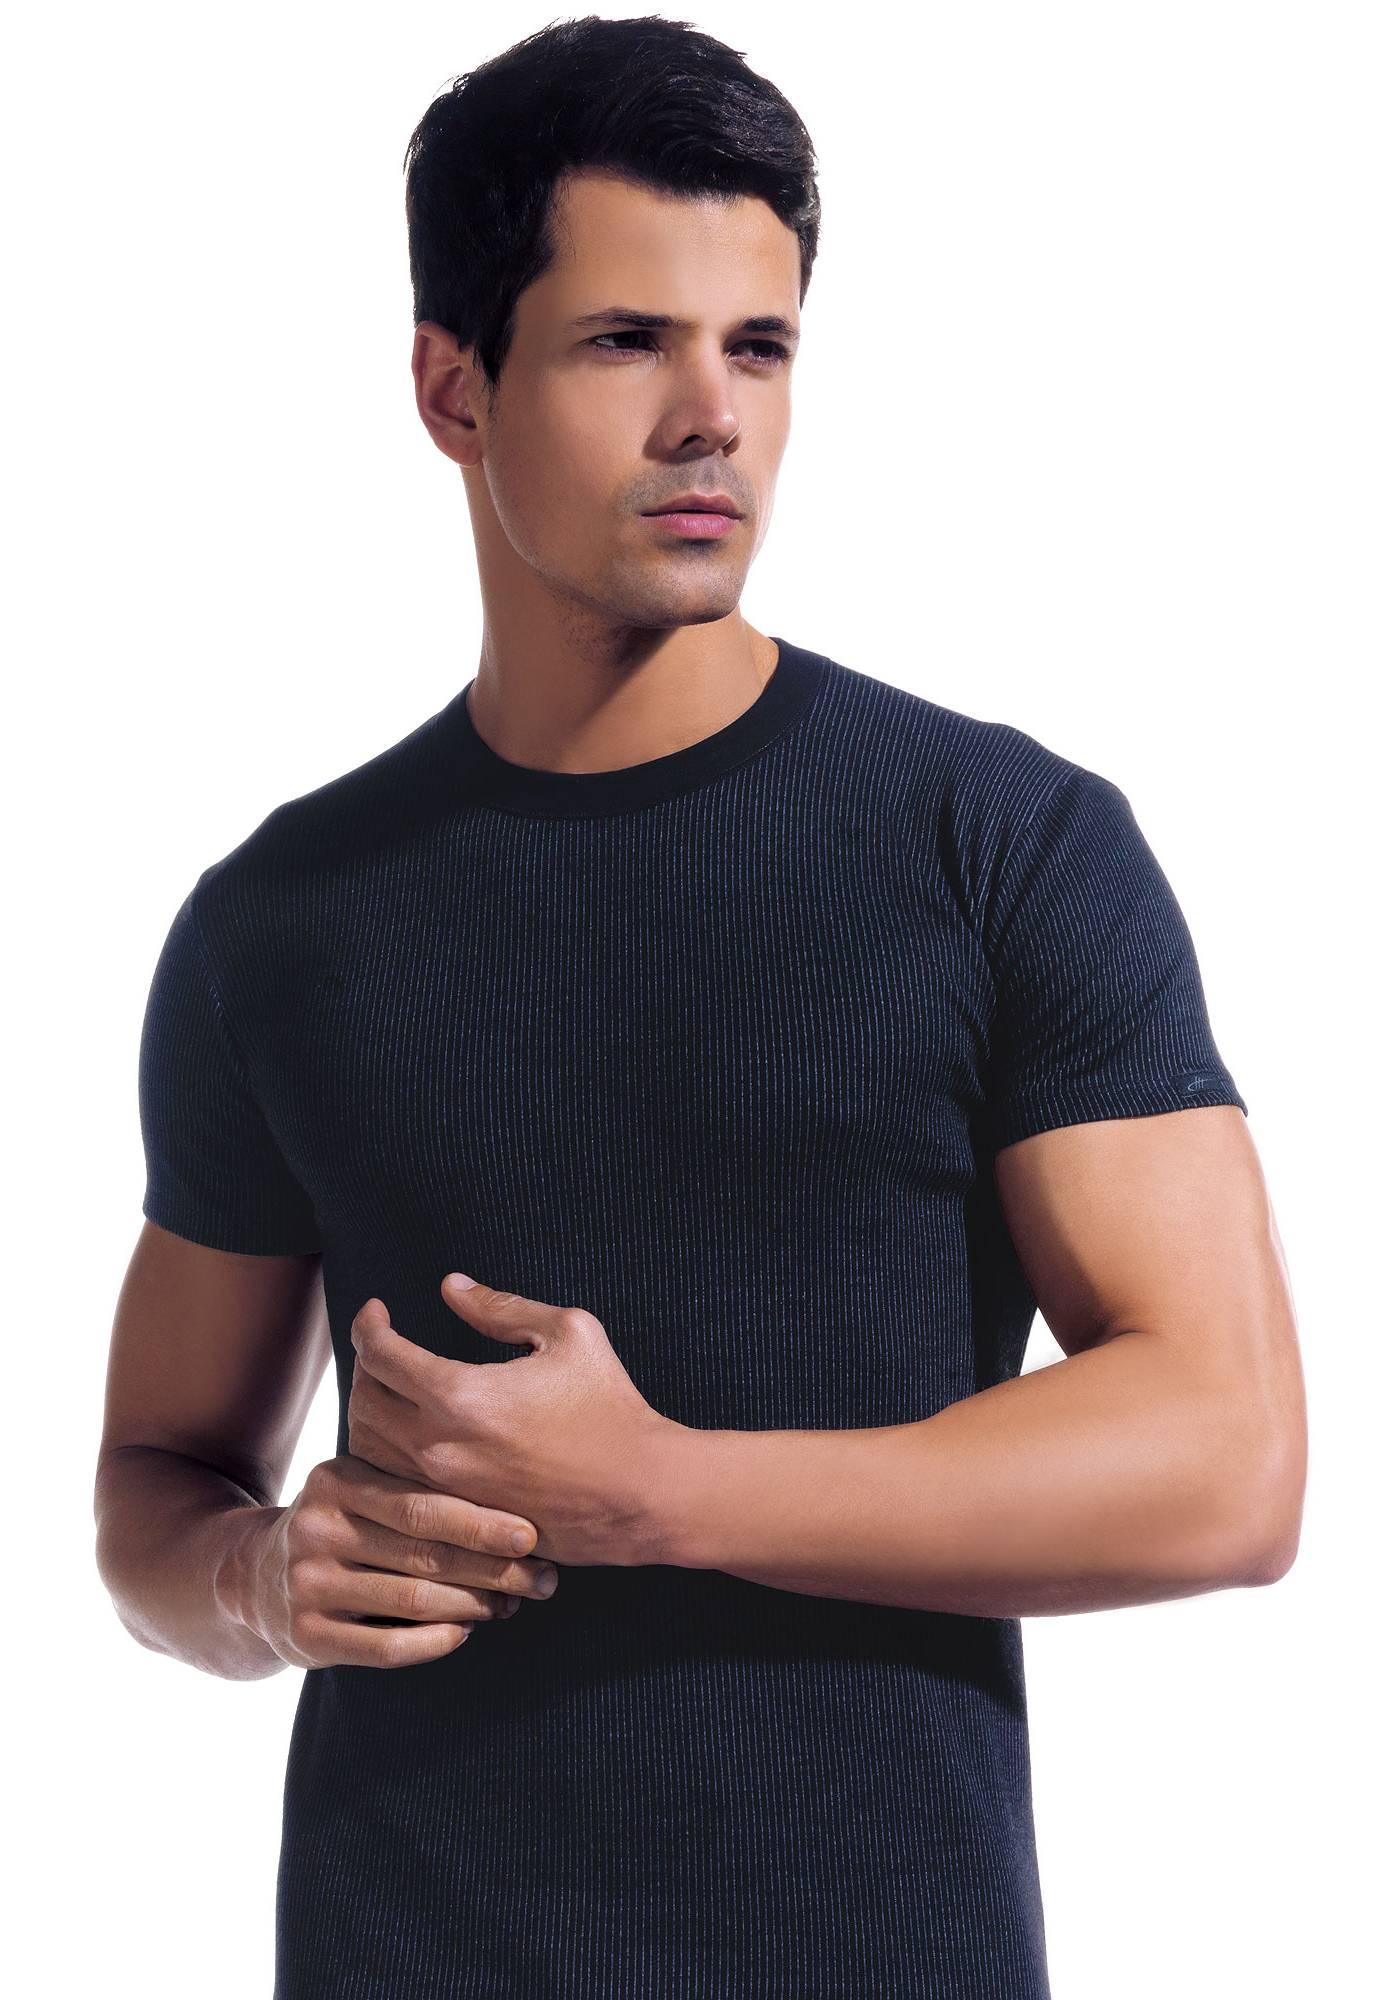 Dagi Termal Kısa Kollu İçlik USA T-Shirt 7610